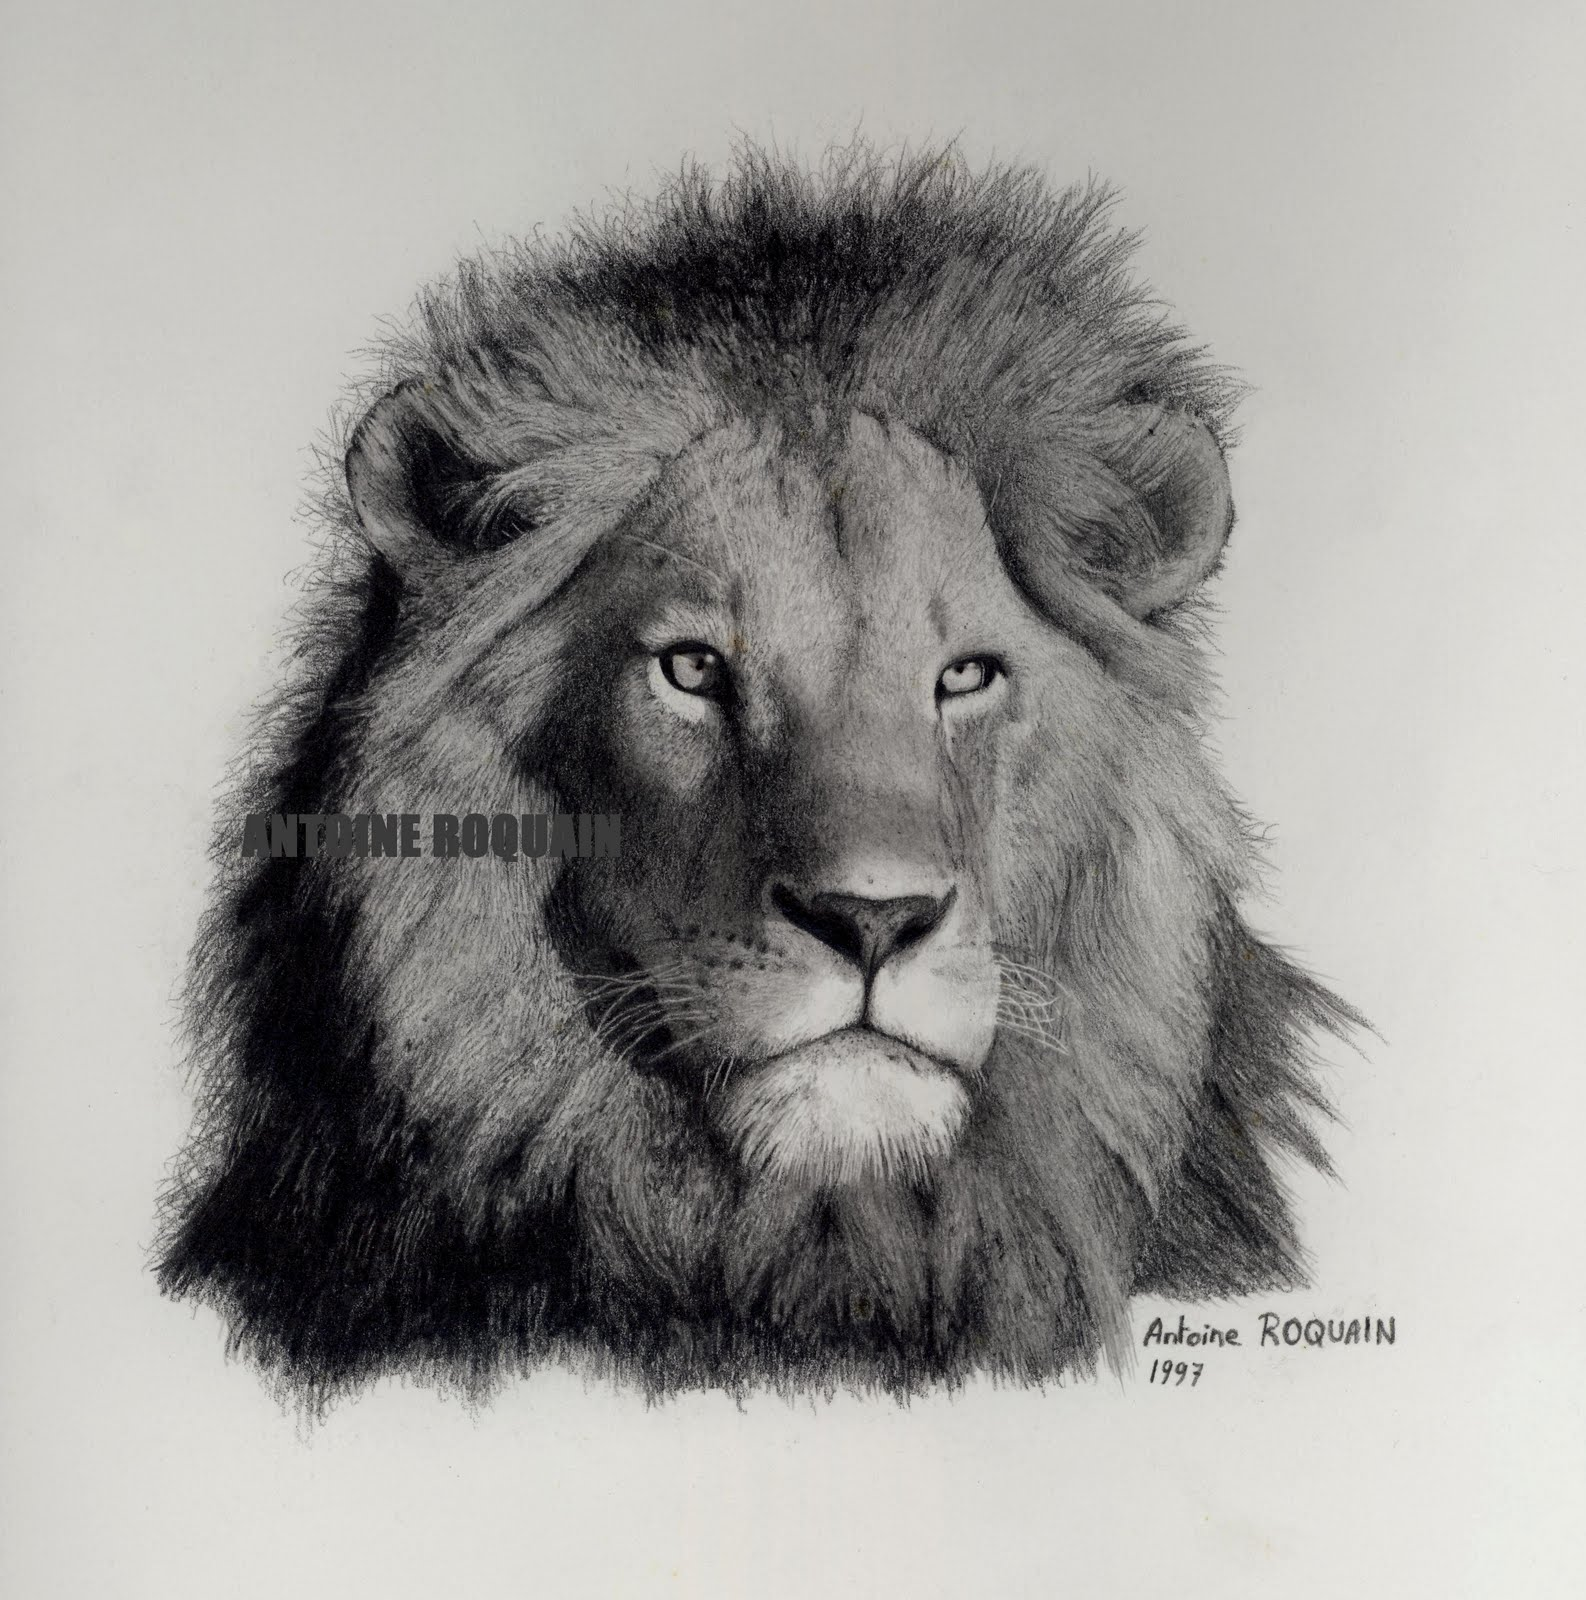 antoine roquain dessin animalier wildlife pencil art petit dessin de lion. Black Bedroom Furniture Sets. Home Design Ideas